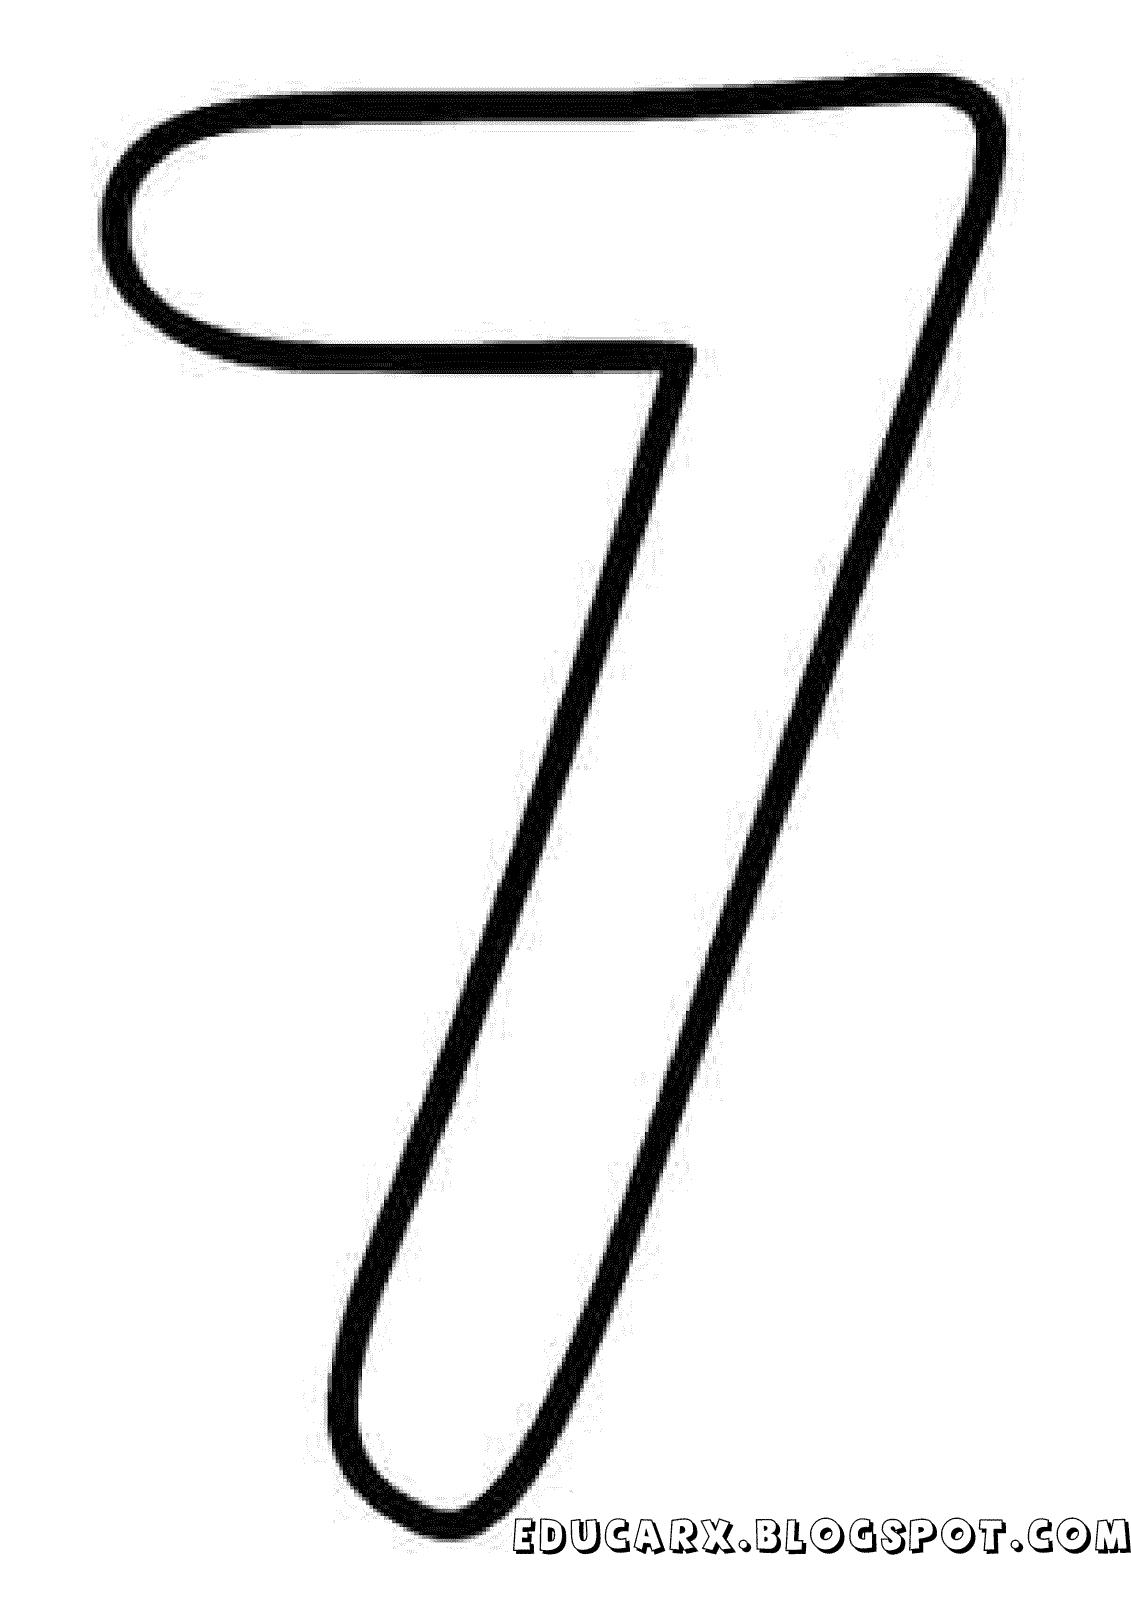 Molde do numero 7